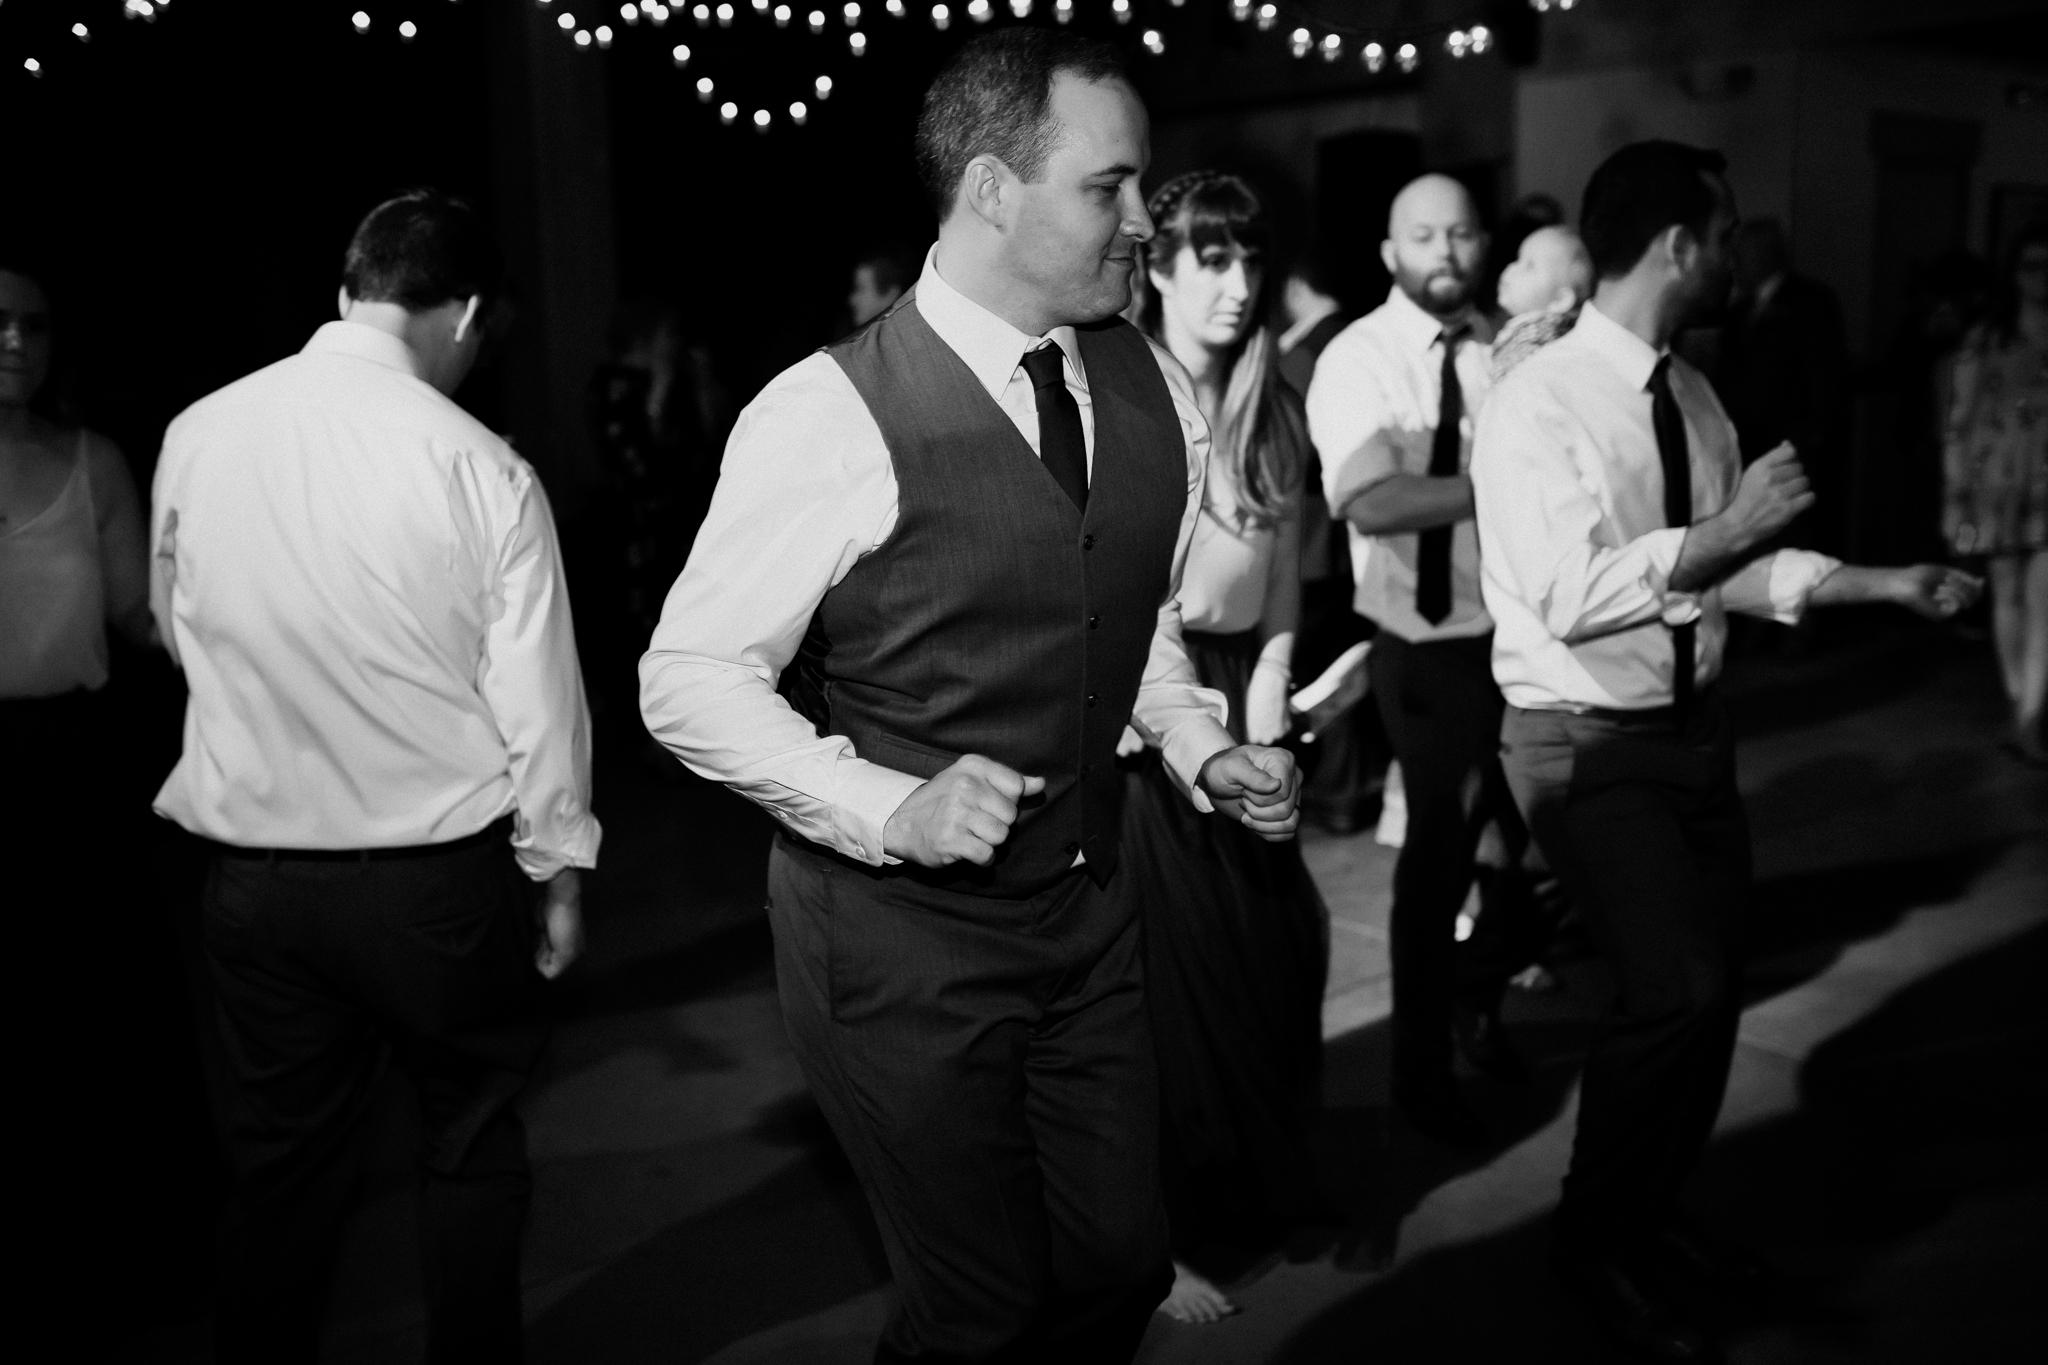 birmingham-alabama-wedding-photographer-laura-terry-the-warmth-around-you (107 of 110).jpg